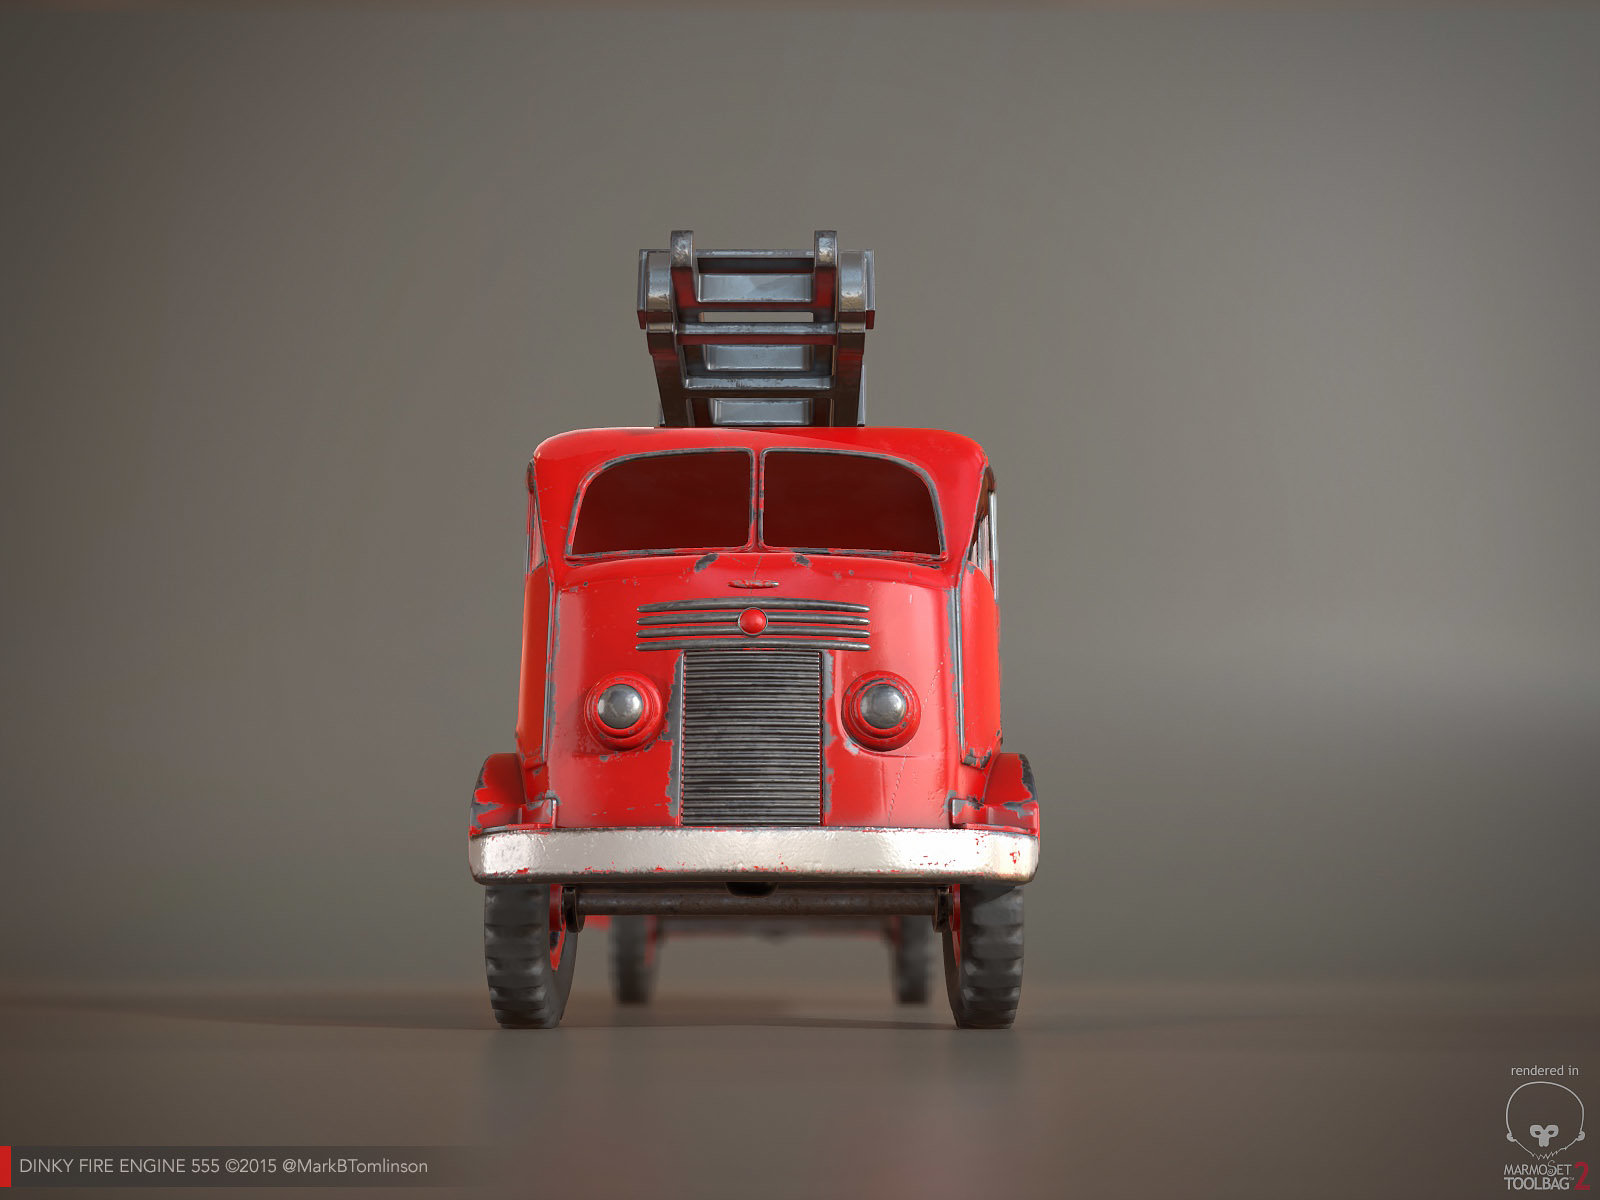 Dinky Fire Engine 555